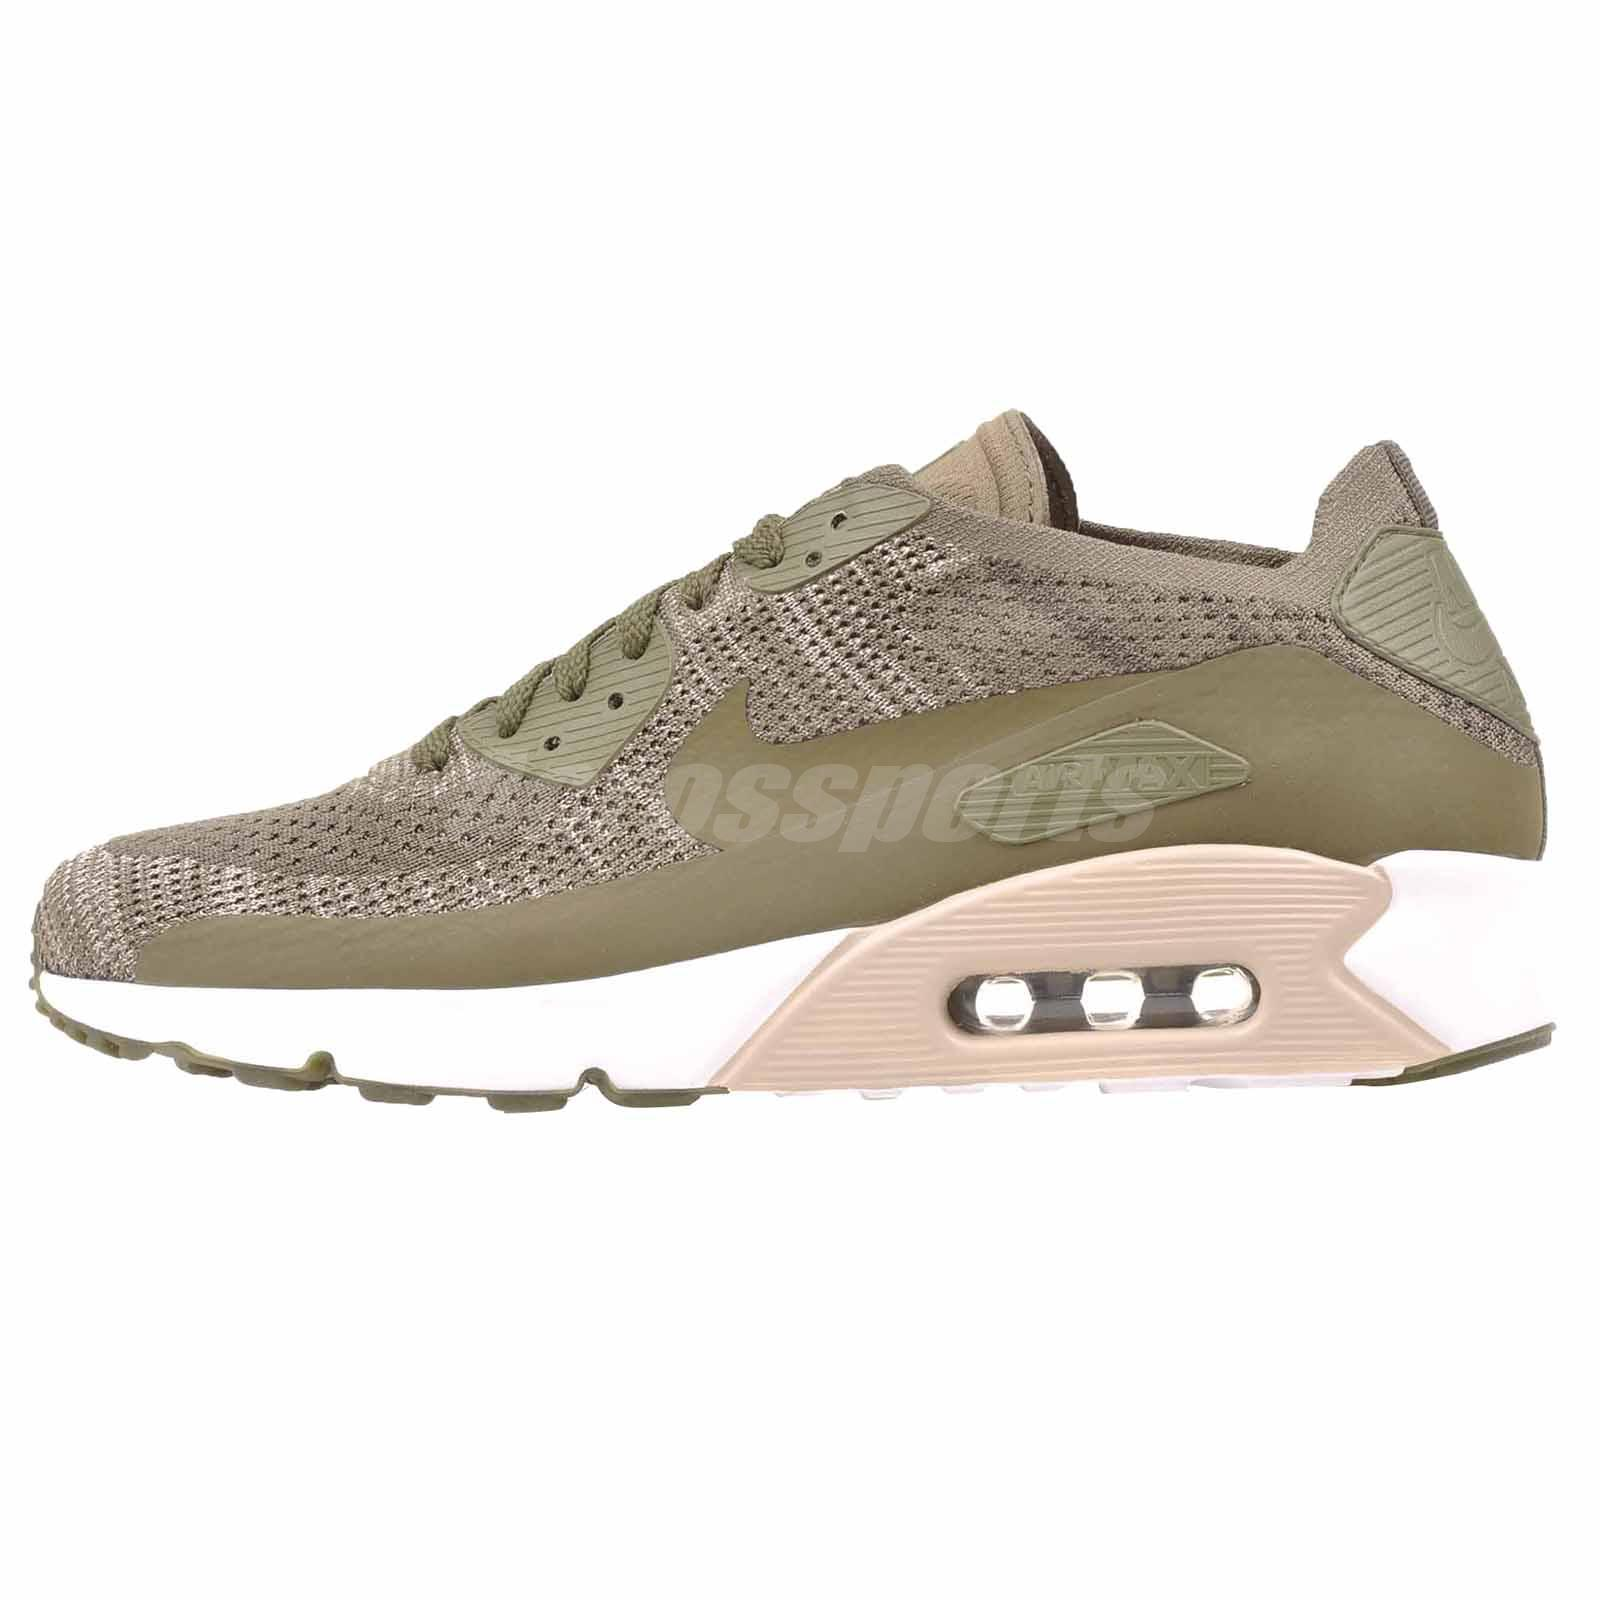 ceffa4942e603 Nike Air Max 90 Ultra 2.0 Flyknit Running Mens Shoes Medium Olive 875943-200